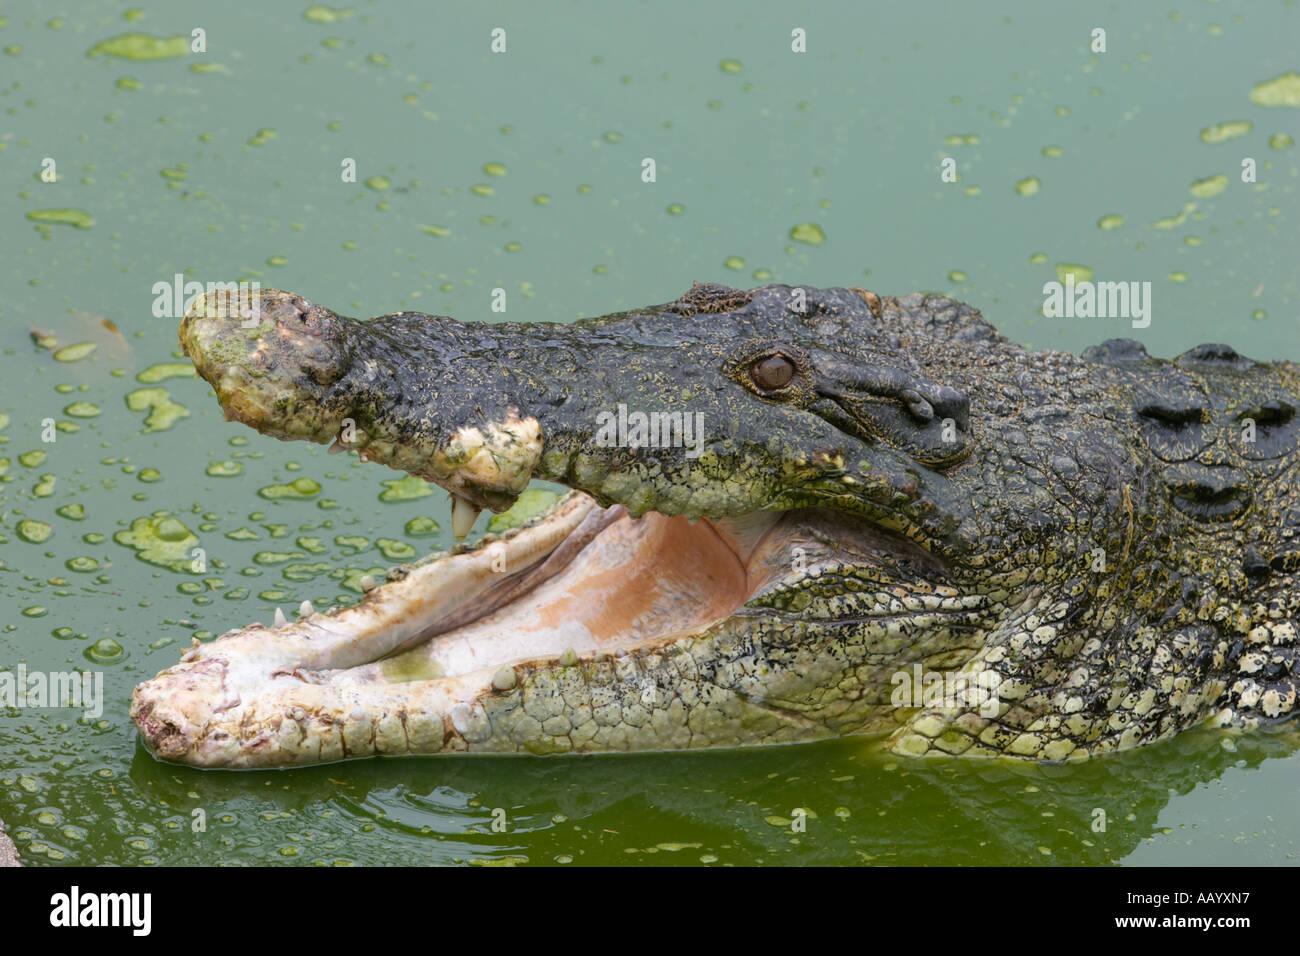 Portrait of an Estuarine crocodile. Langkawi Crocodile Farm, Langkawi island, Malaysia. - Stock Image